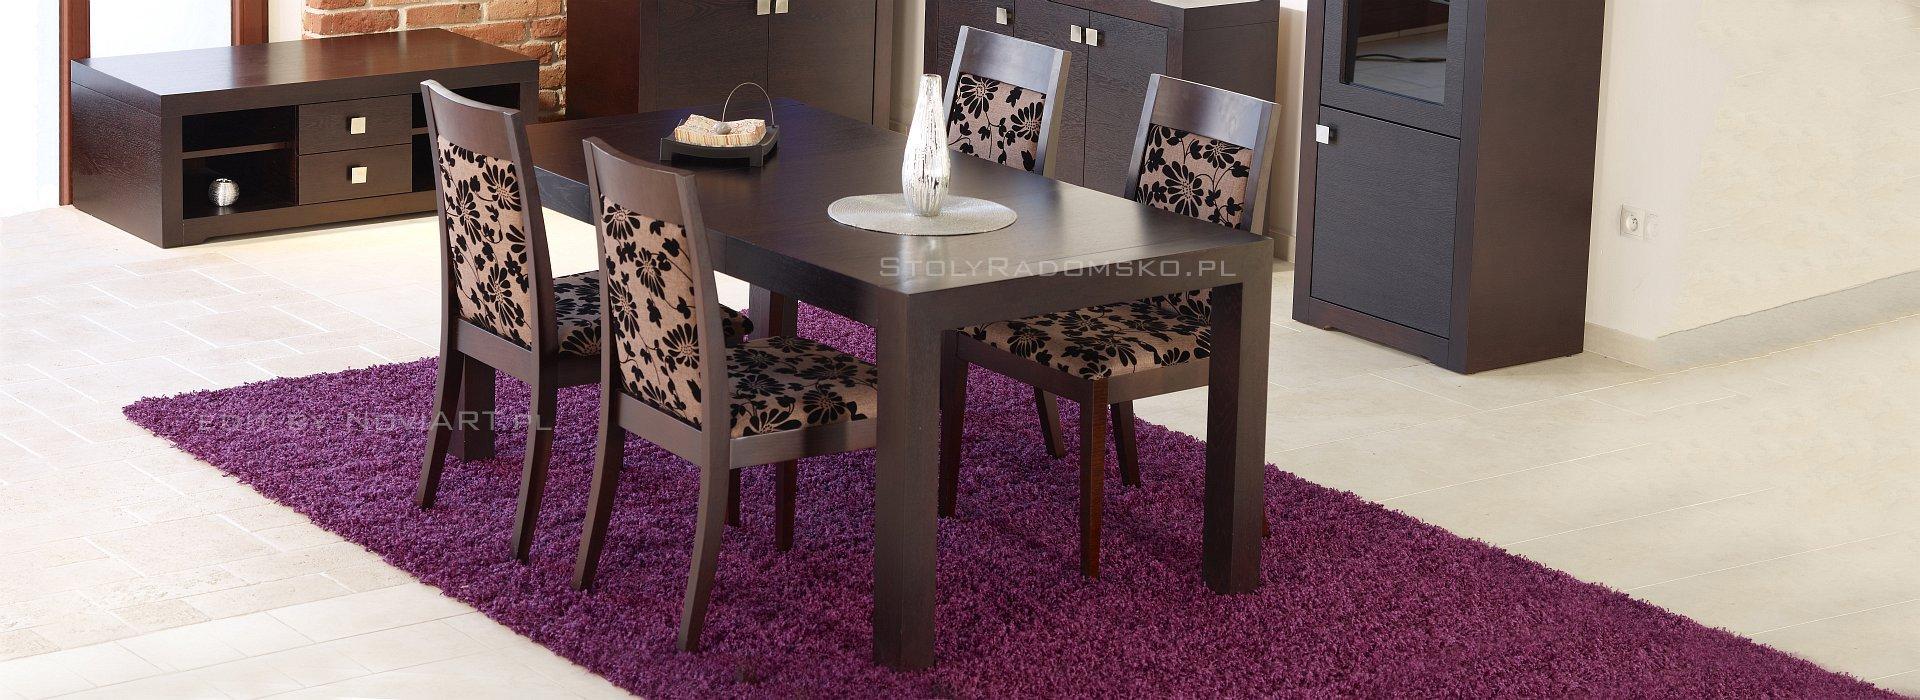 sto y radomsko sto y blaty do sto w podstawy do sto w. Black Bedroom Furniture Sets. Home Design Ideas